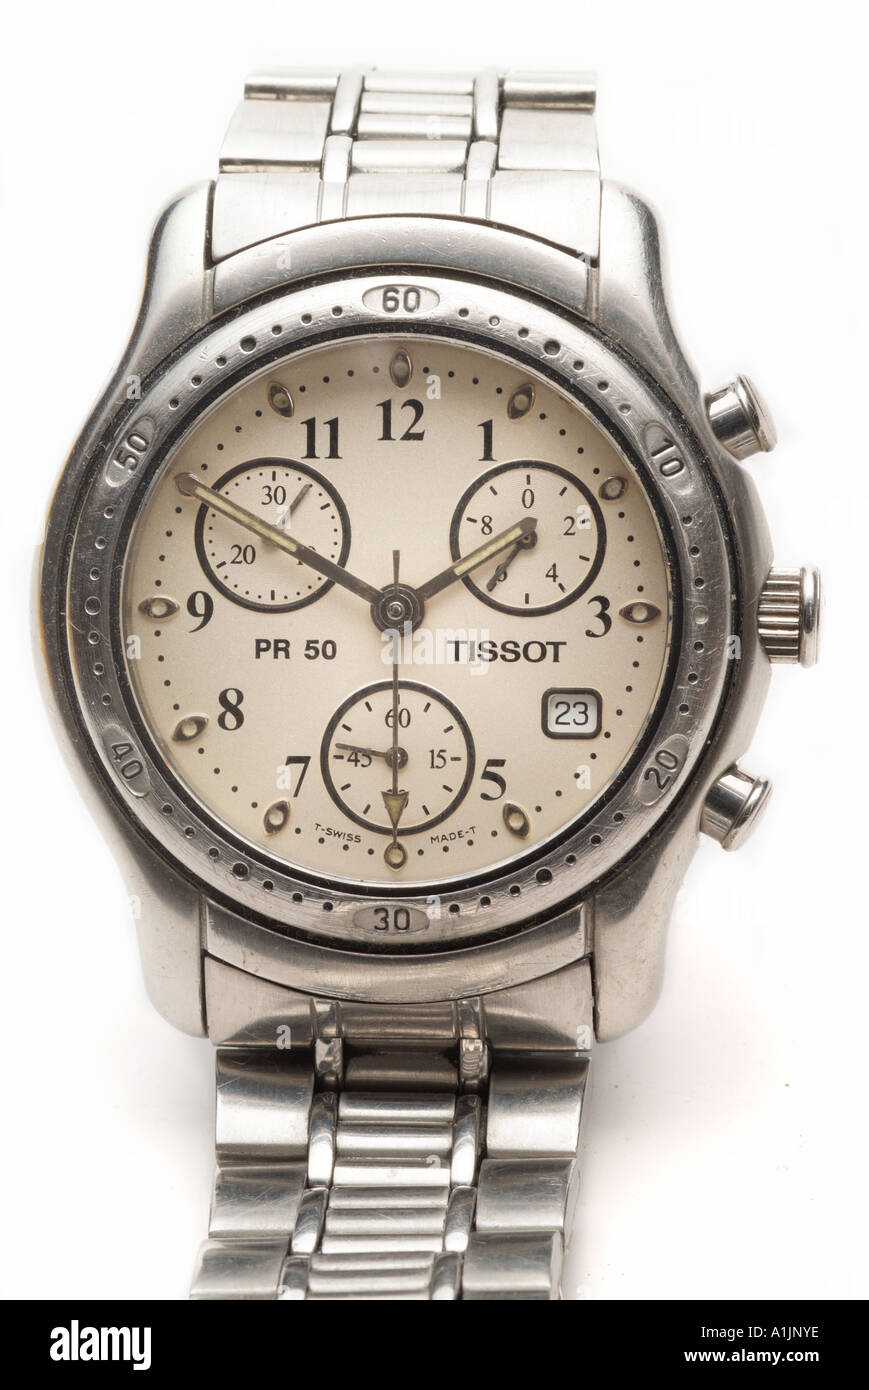 Tissot chronograph wrist watch time piece titanium sapphire hour minute second date day luminous hand finger elapsed bezel steel - Stock Image